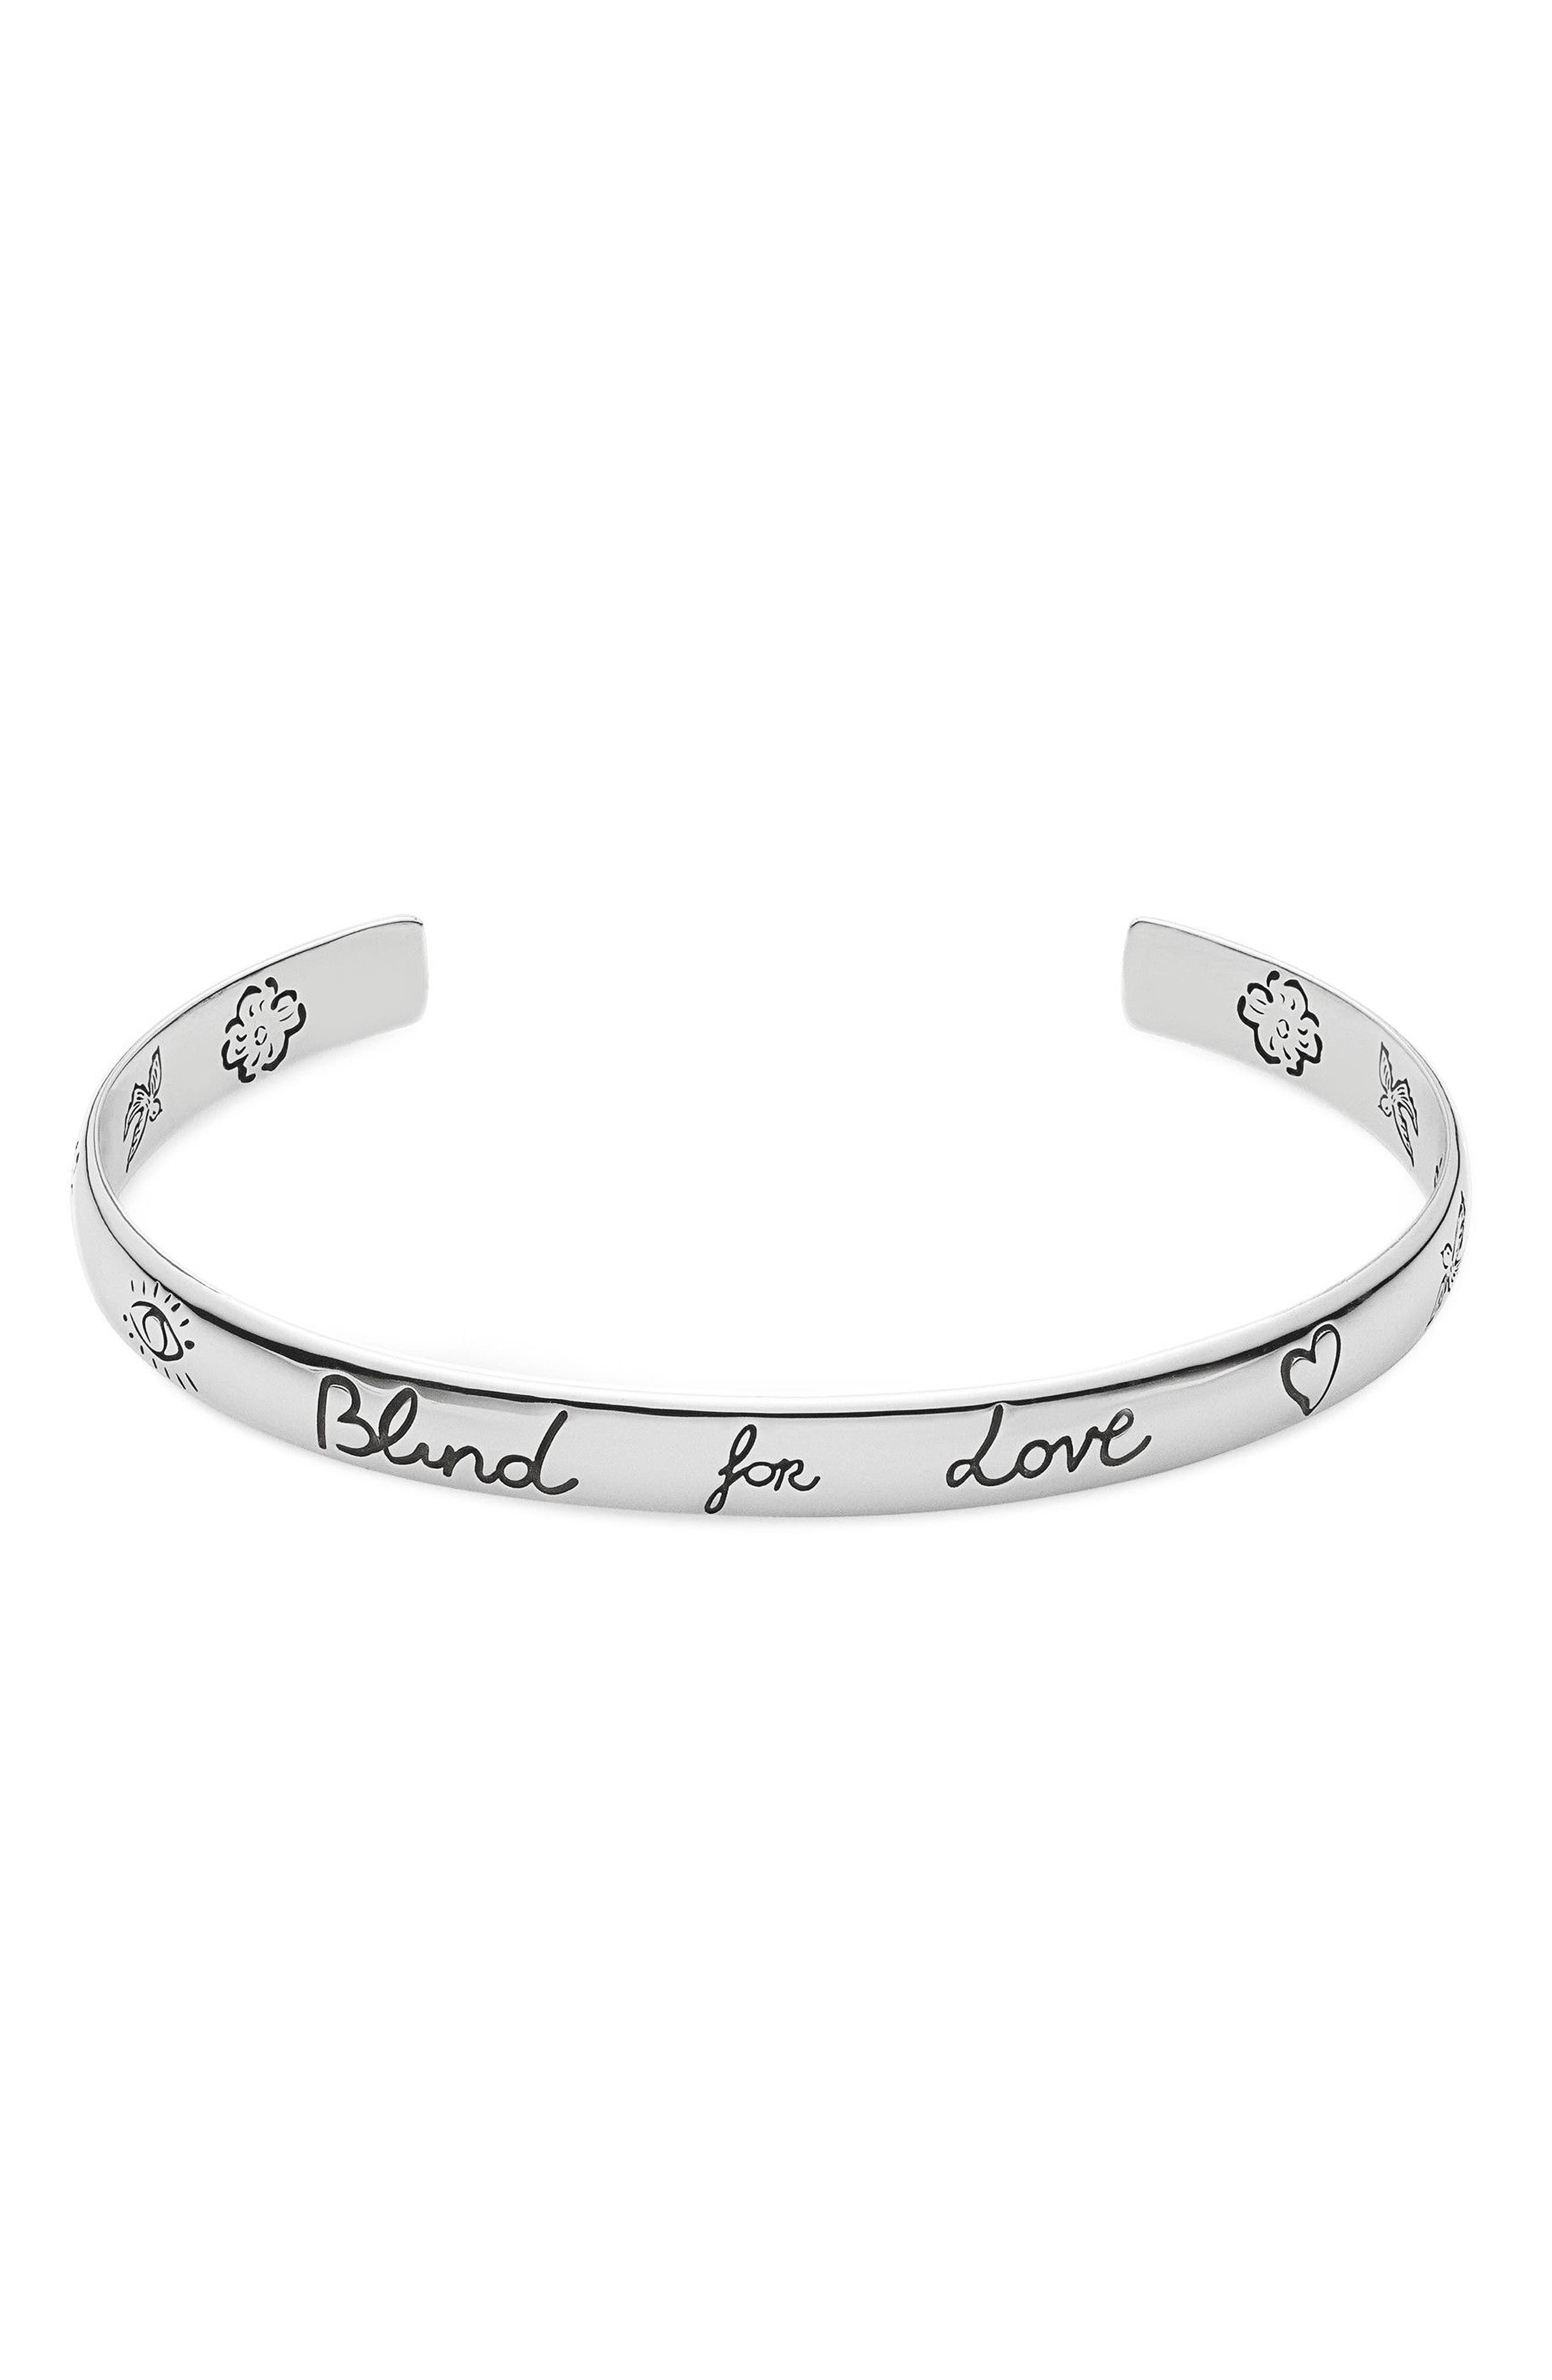 Gucci Silver Blind for Love Cuff